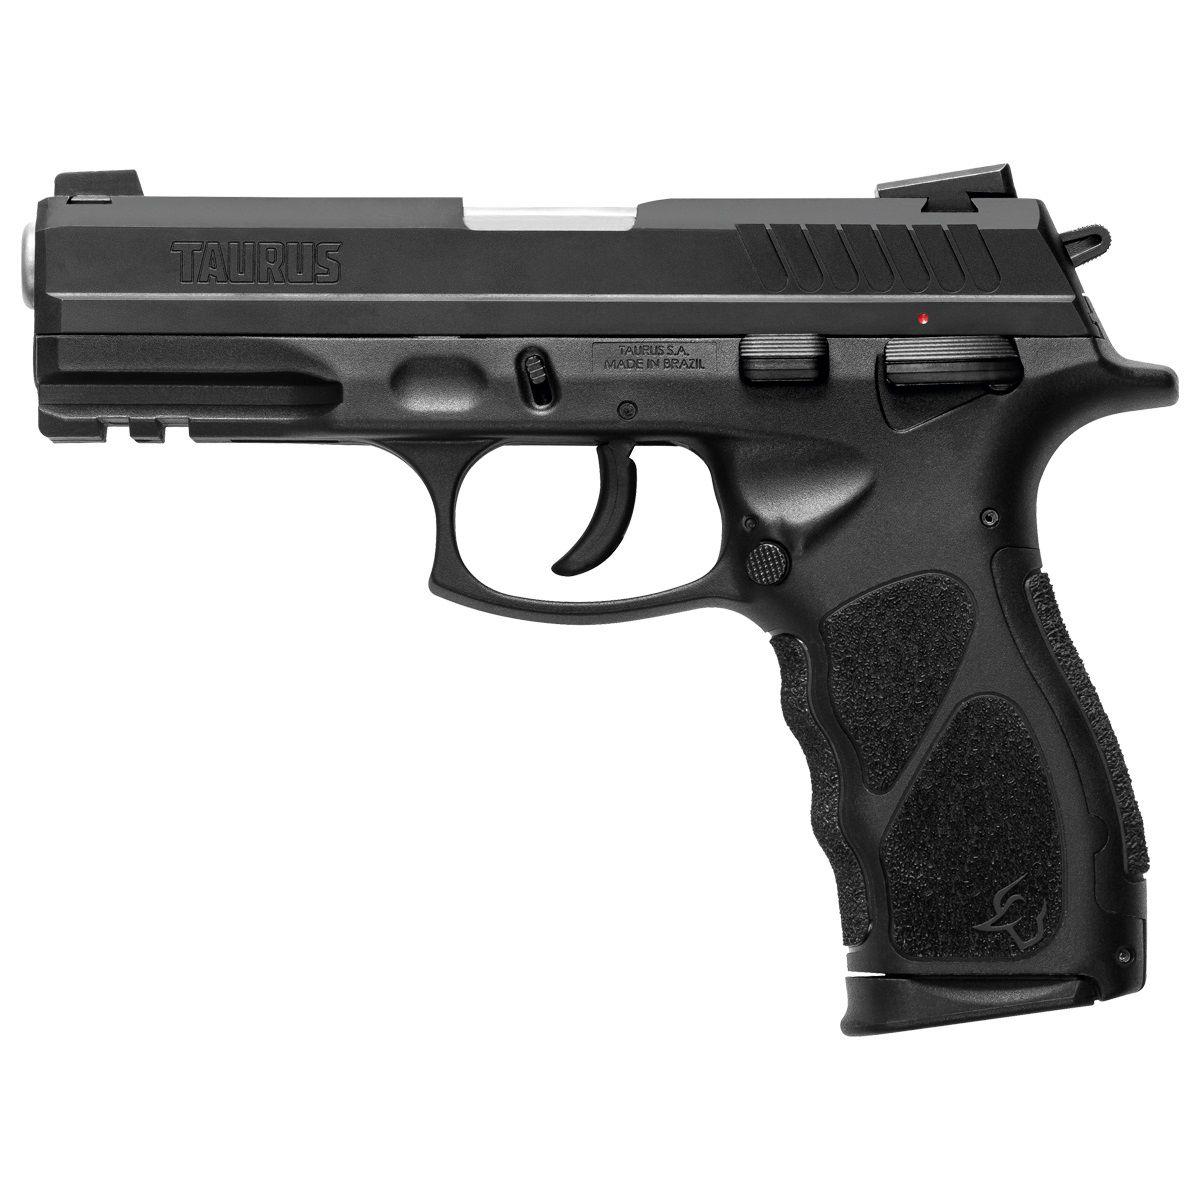 "Pistola Taurus .40 S&W TH40/13 4"" TENEF"